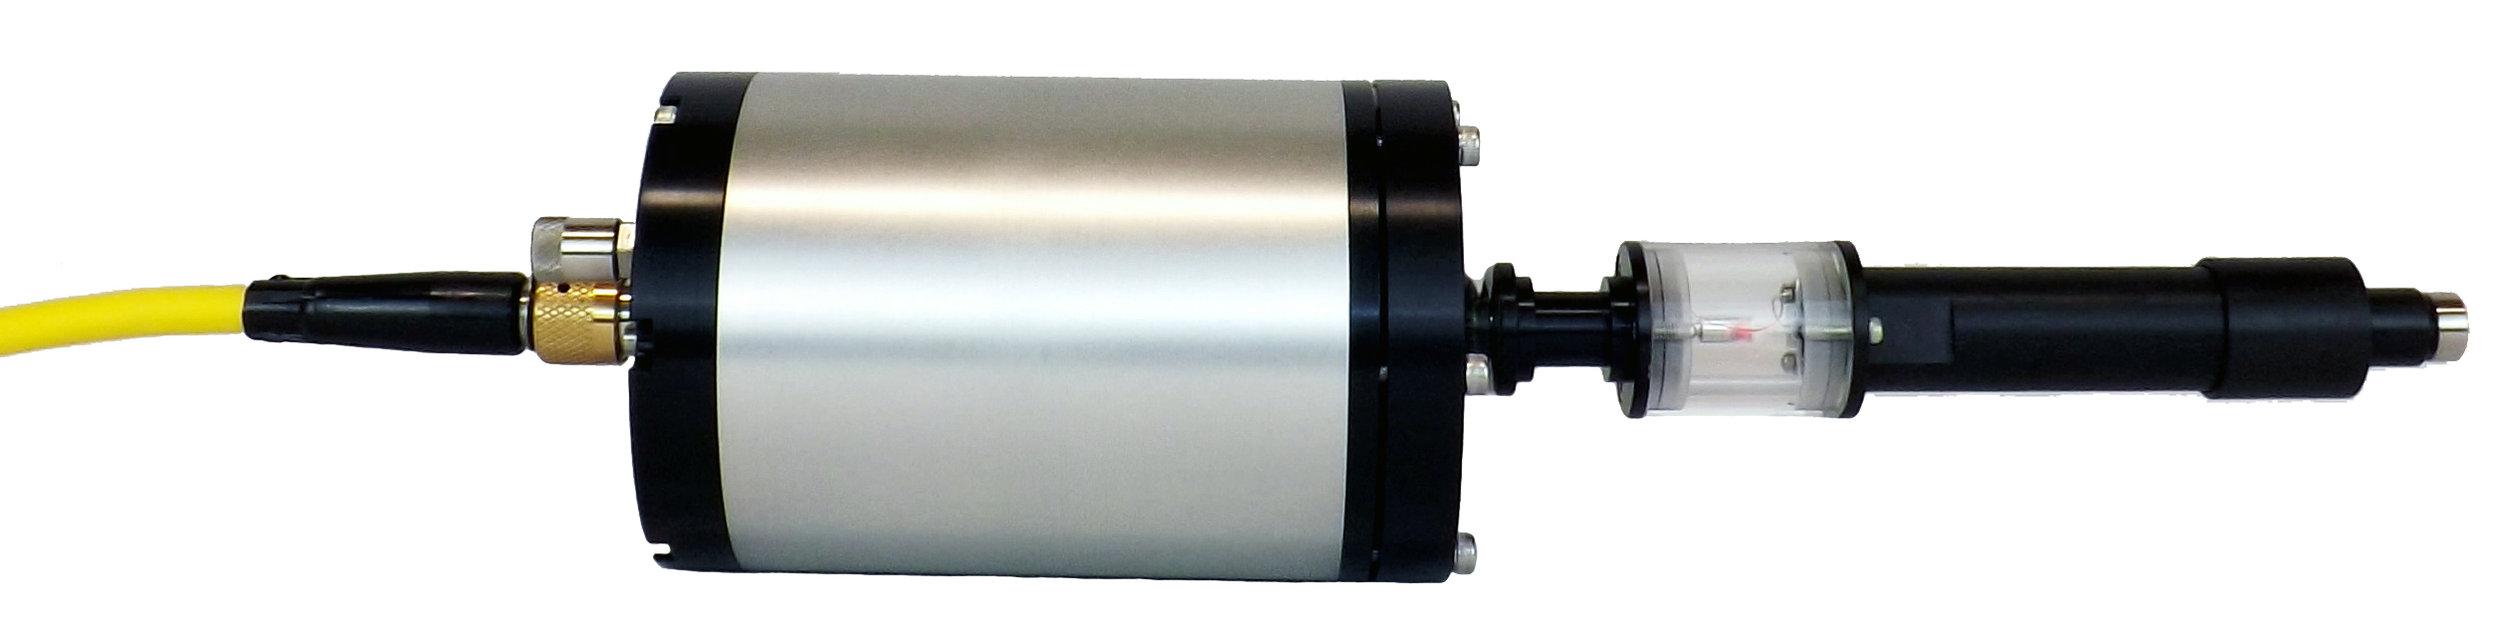 Inuktun Laser Profiler 3 cropped.jpg